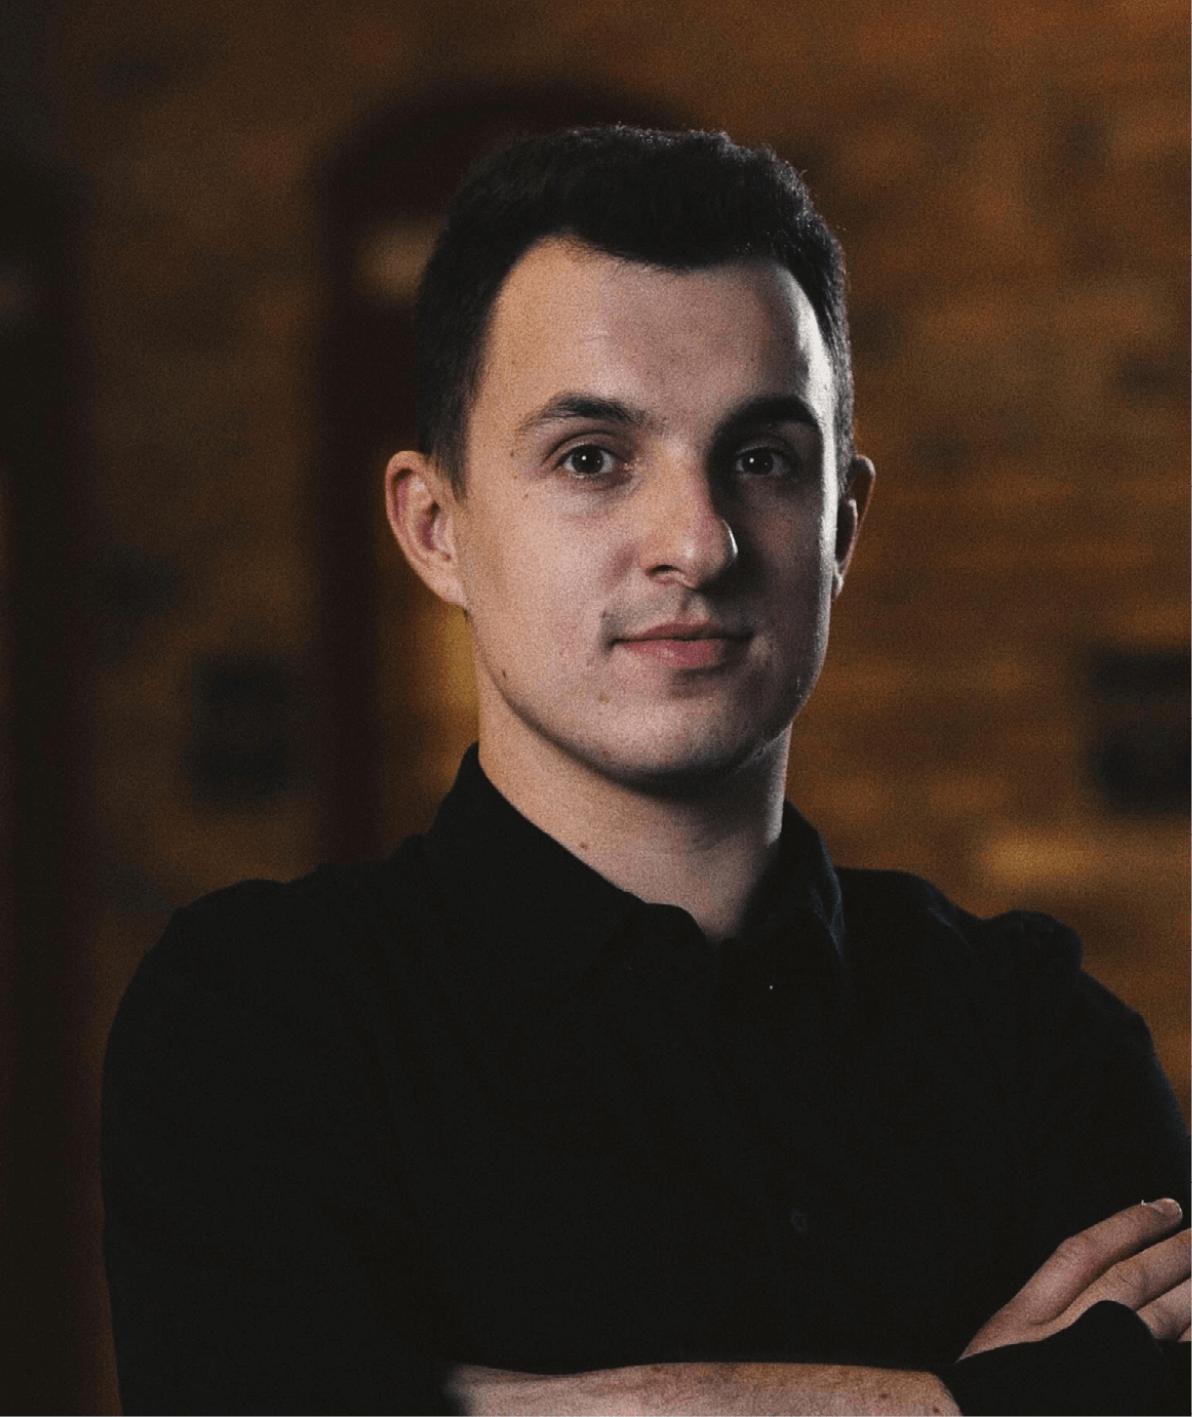 Kacper Zdunek